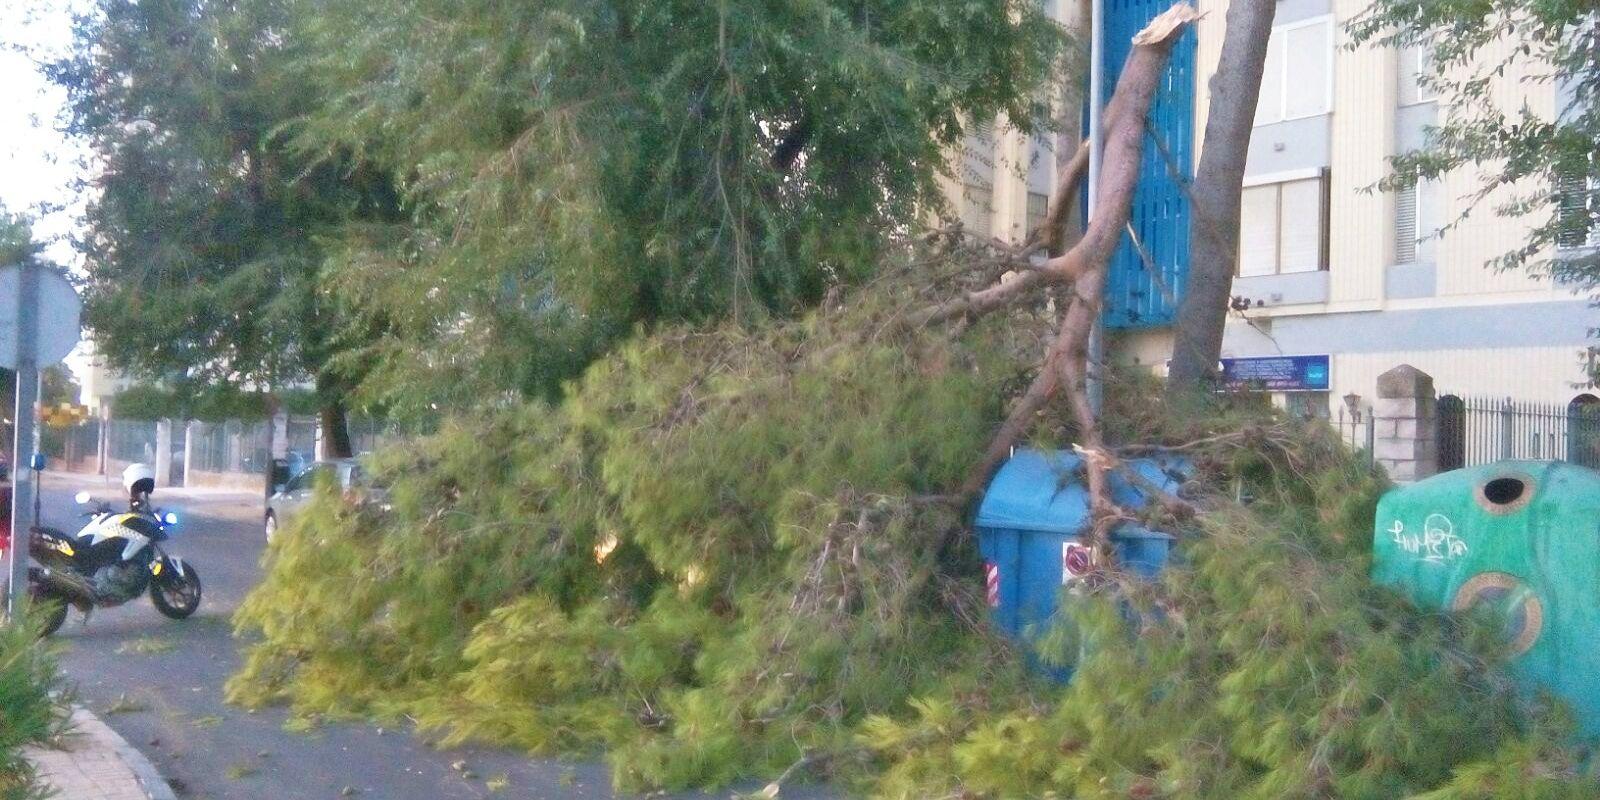 rama arbol caida en Jerez 3